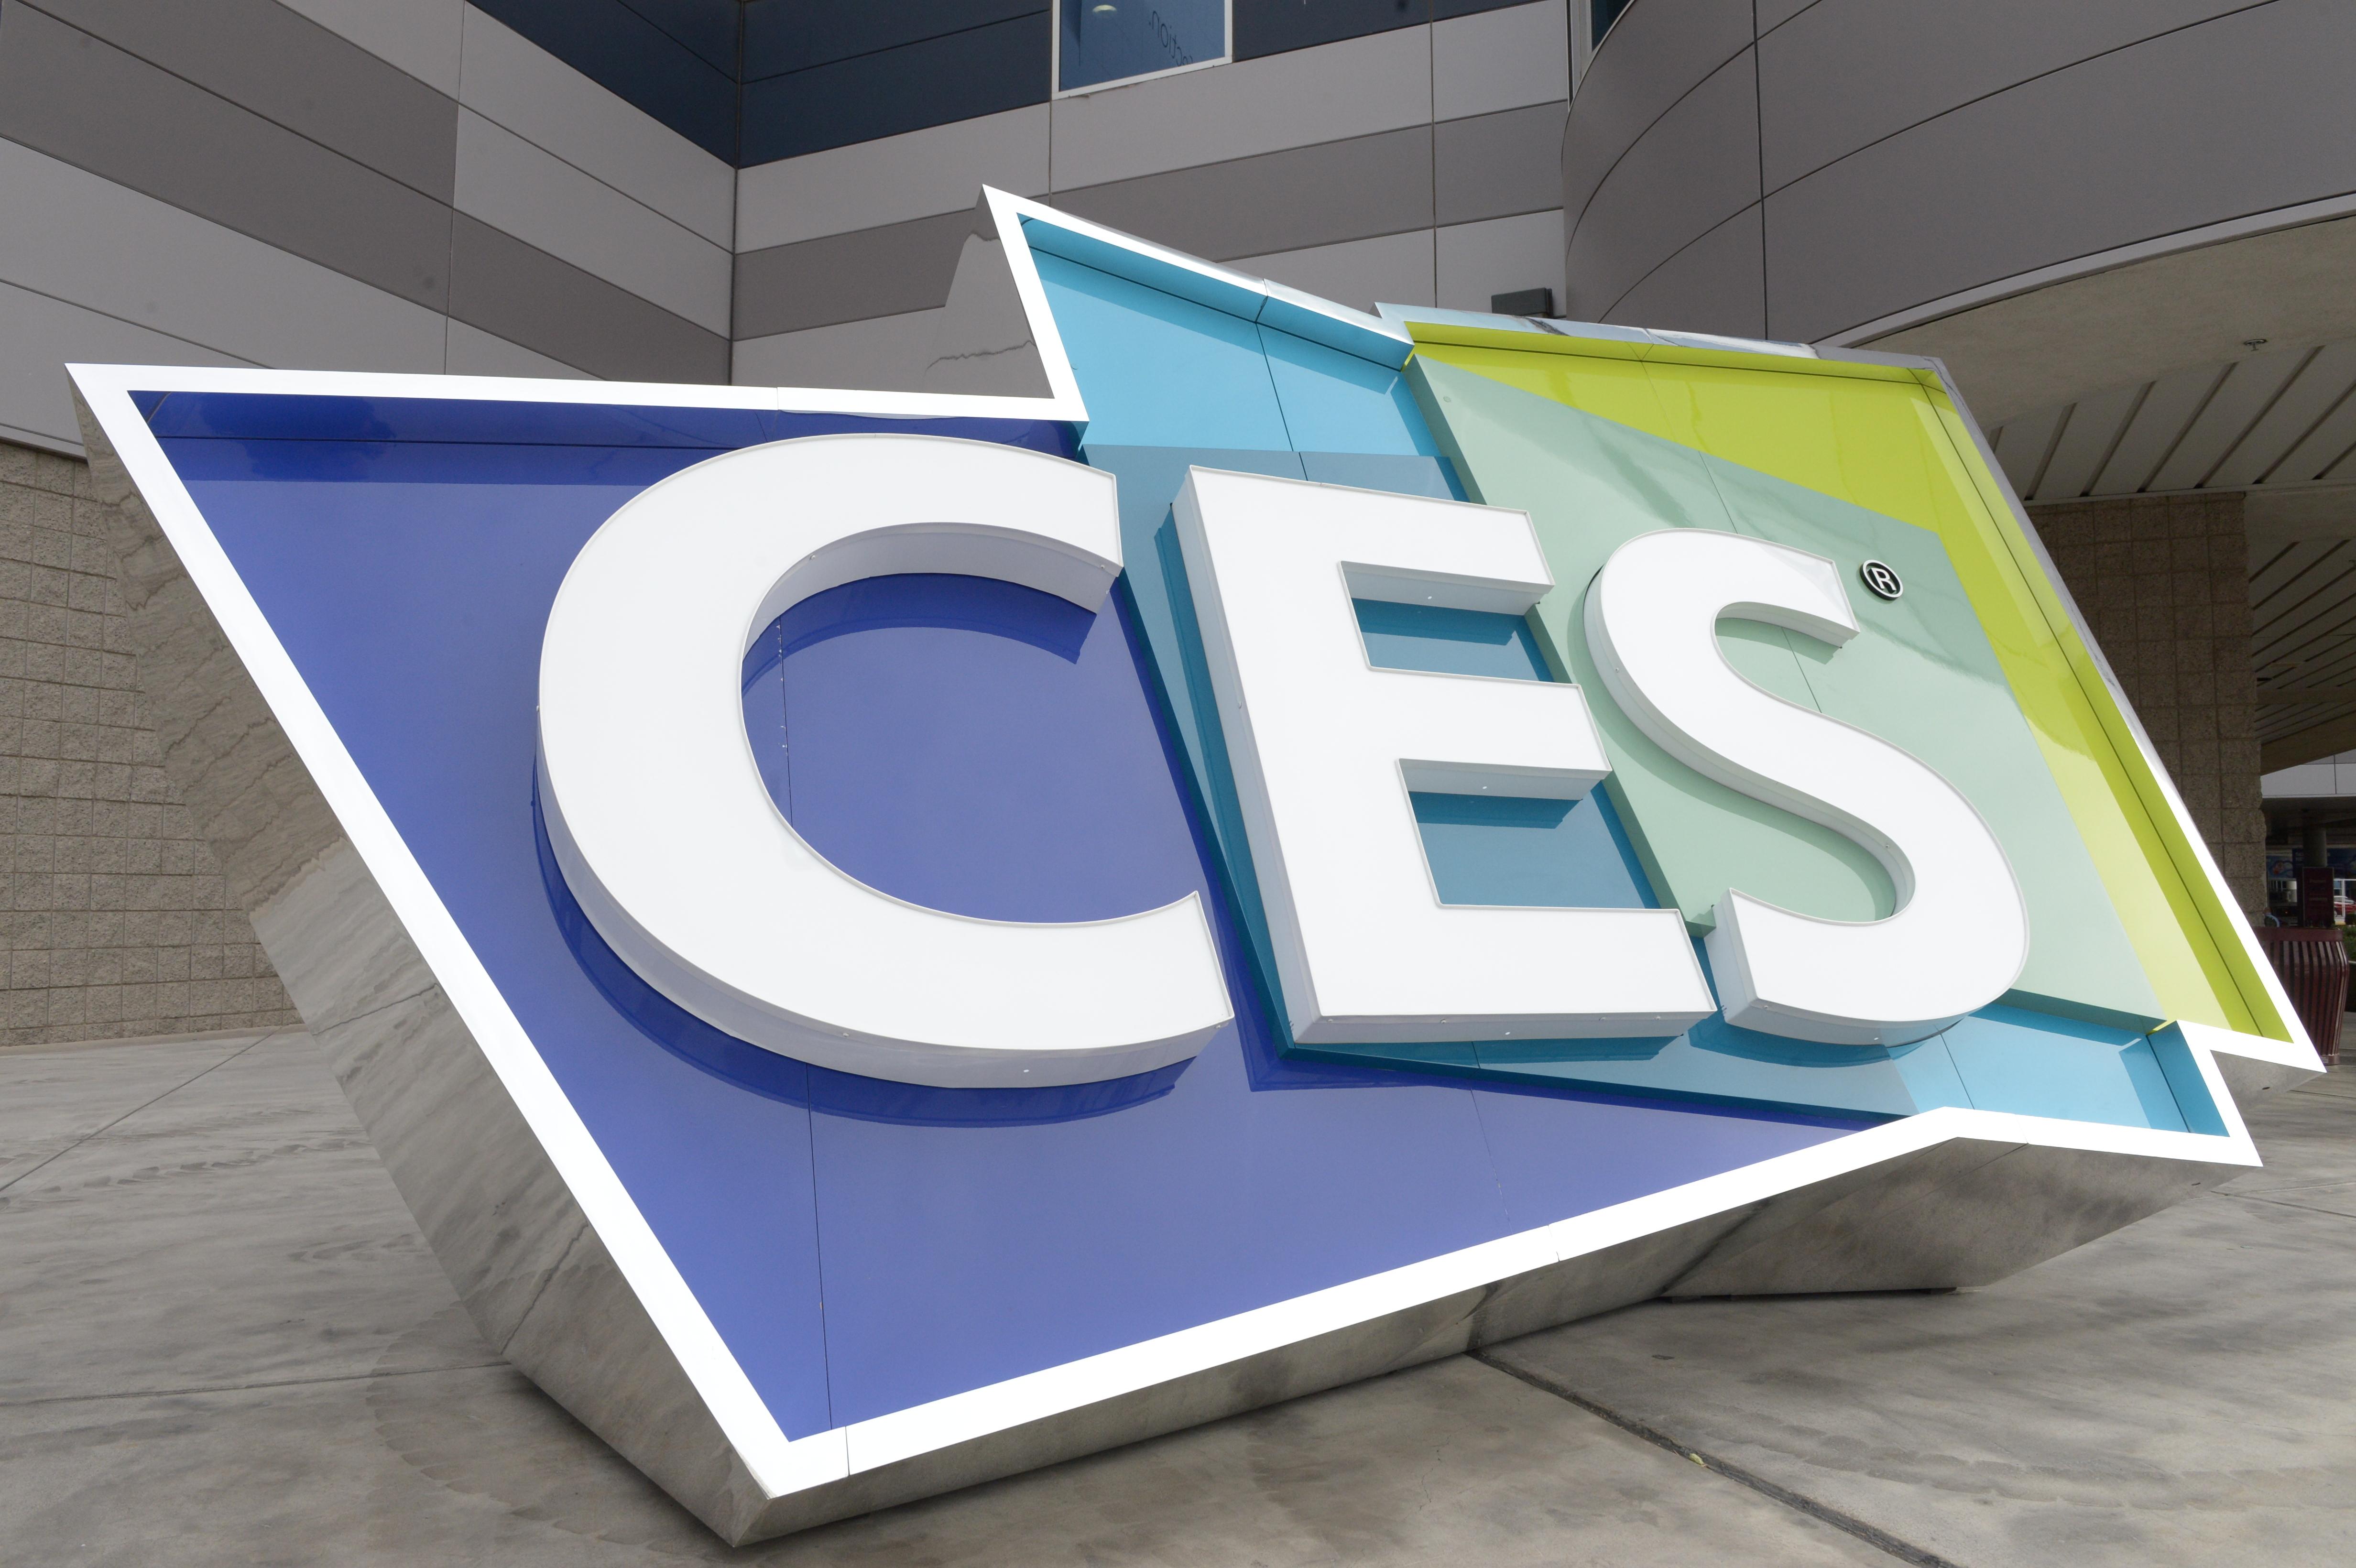 2016 Consumer Electronics Show (CES) in Las Vegas